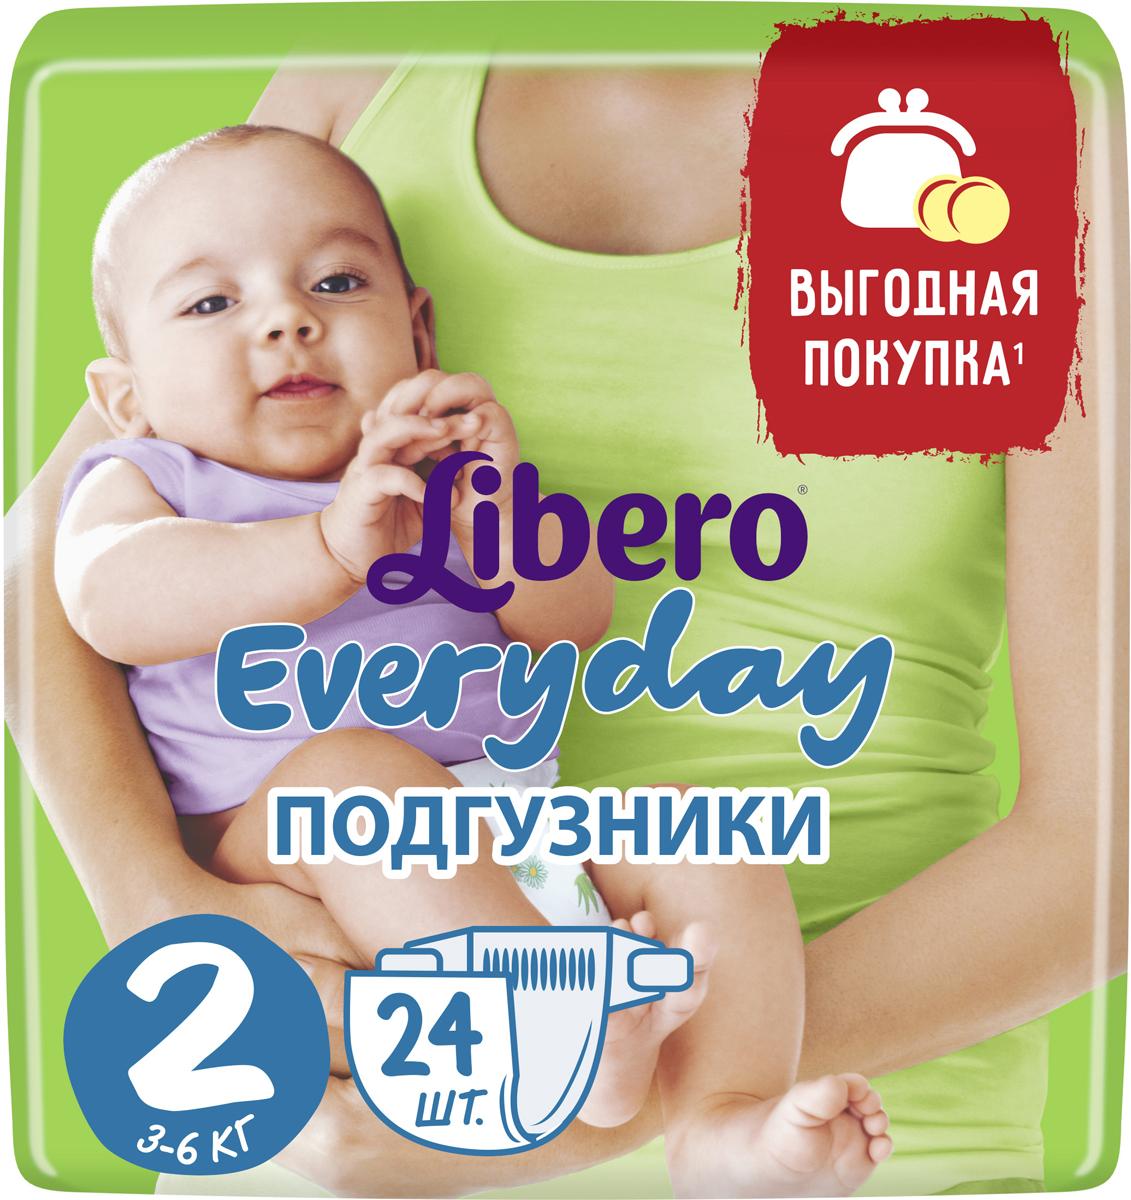 Libero Подгузники Everyday Size 2 (3-6 кг) 24 шт libero подгузники everyday size 5 11 25 кг 38 шт